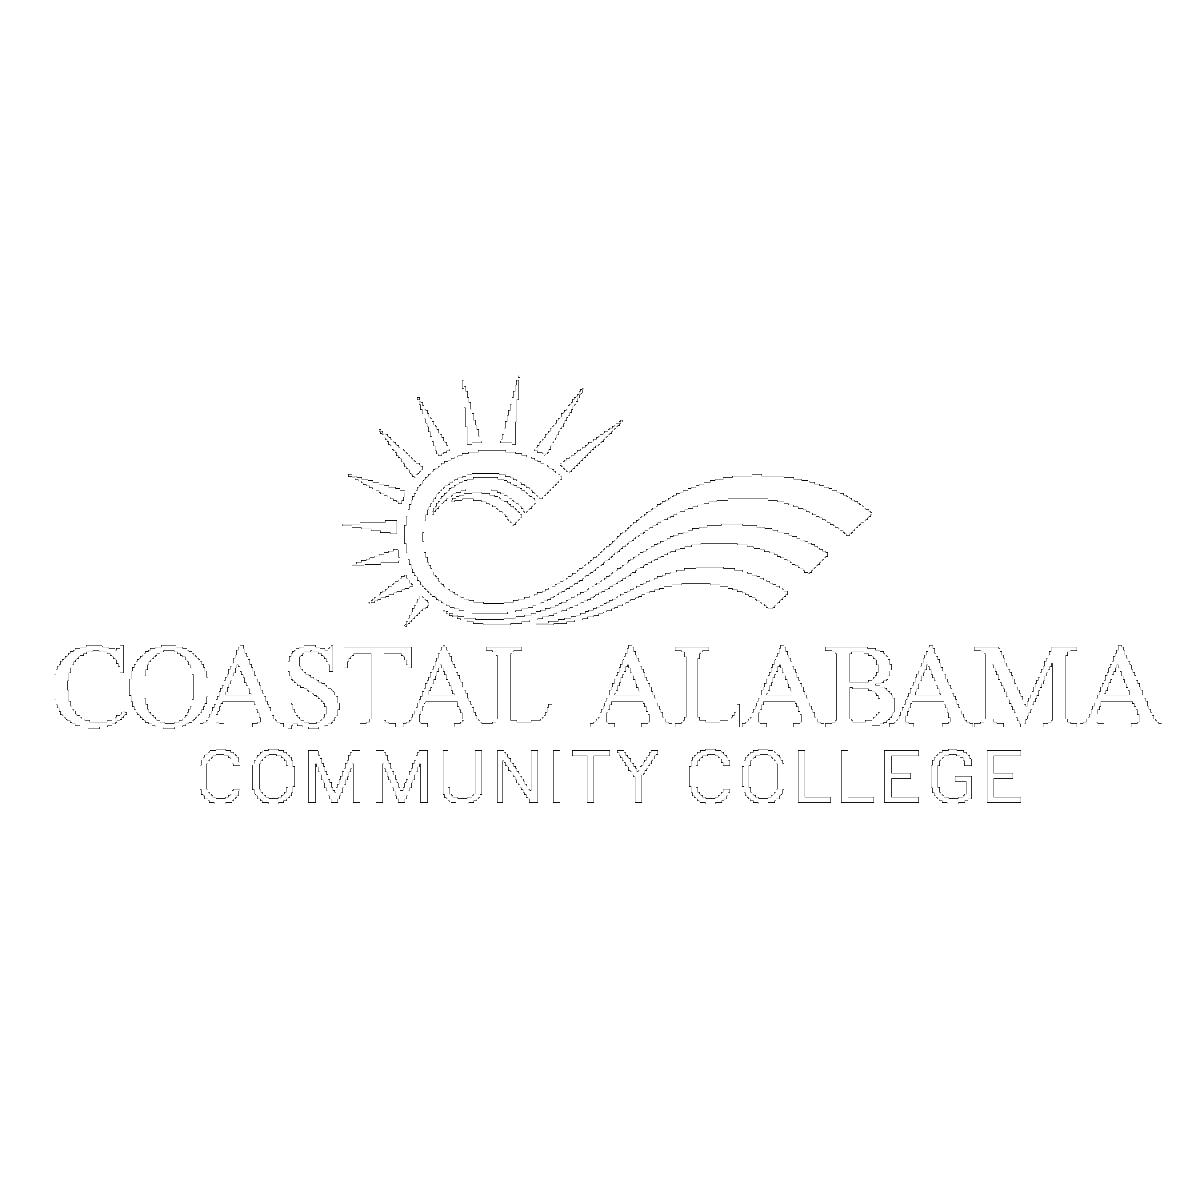 College Logos2.png